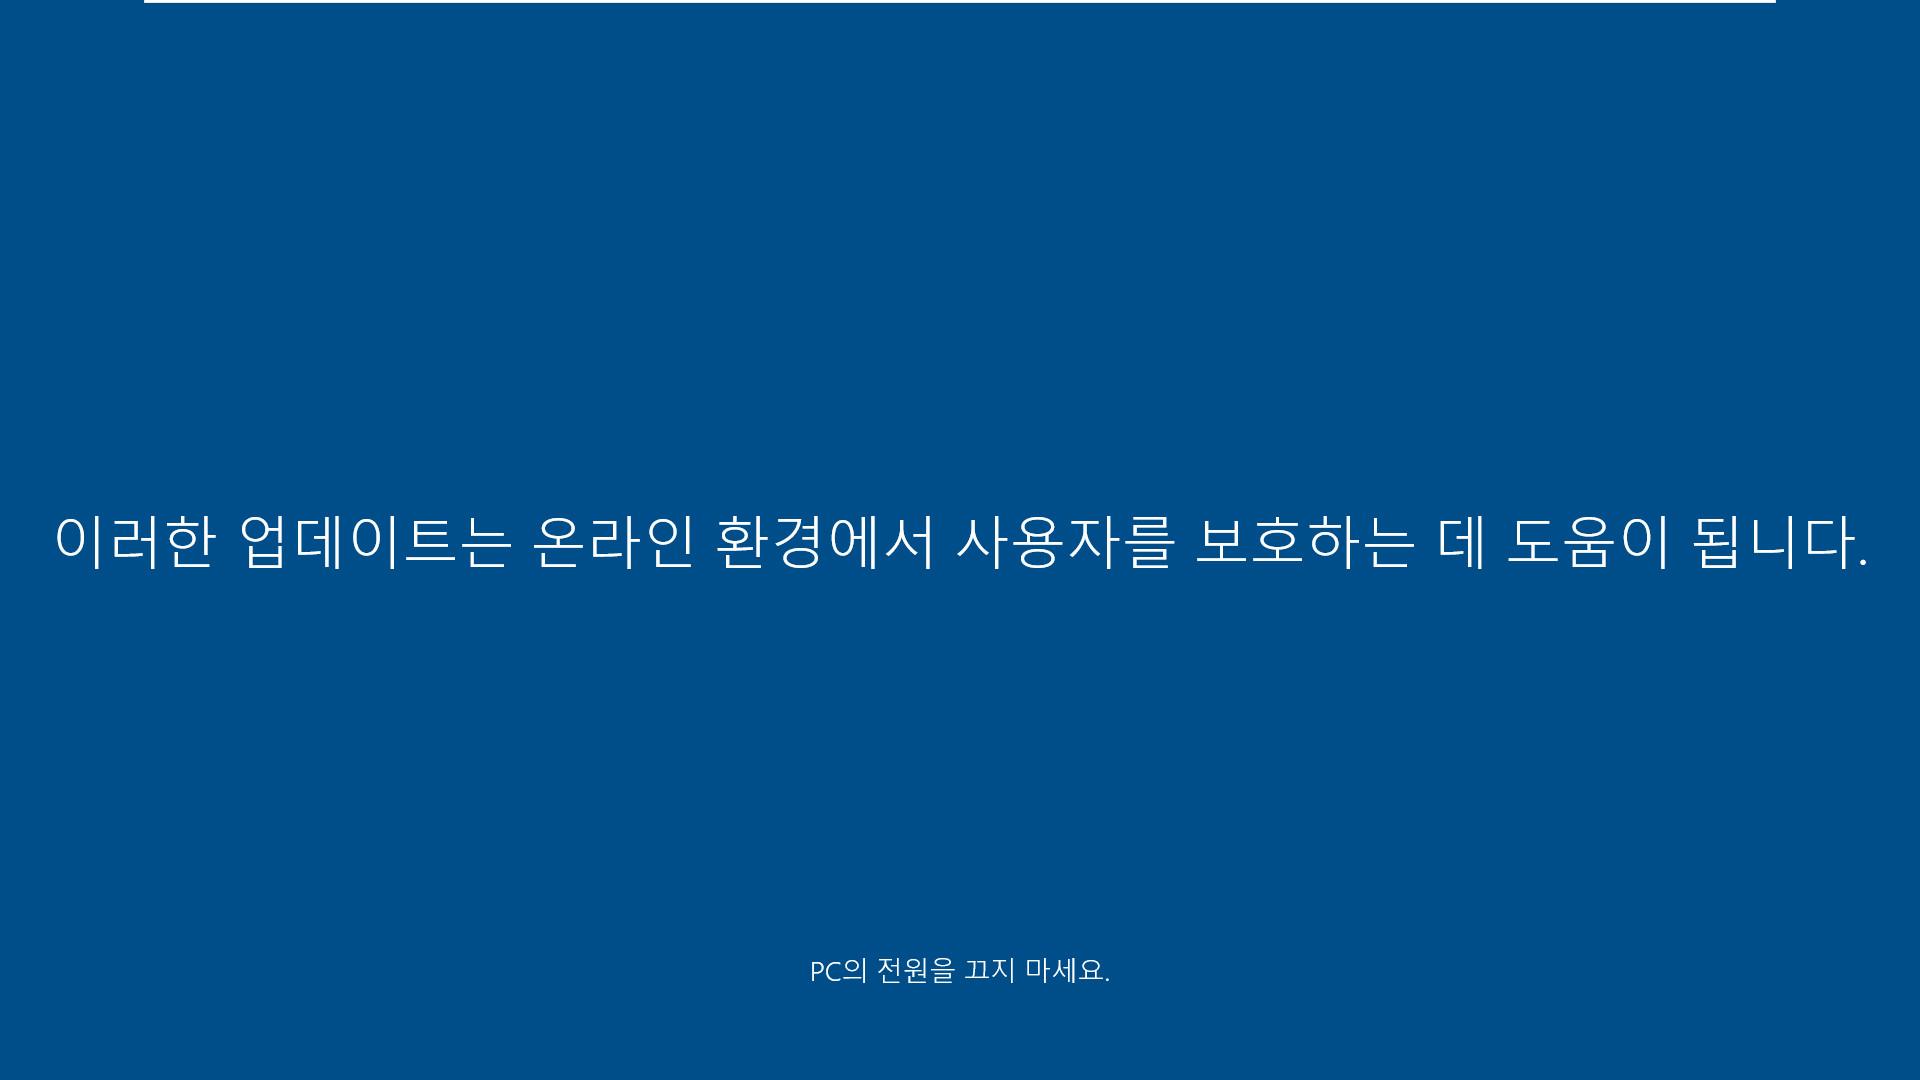 Windows 10 Enterprise LTSC [2019] (버전 1809) 를 버전 1903 프로로 업그레이드 설치하기 - 우선 설정과 앱 유지를 위해서 버전 1903 Enterprise로 업그레이드 한 후에 버전 1903 Pro로 변경하면 됩니다 2019-11-12_052201.jpg